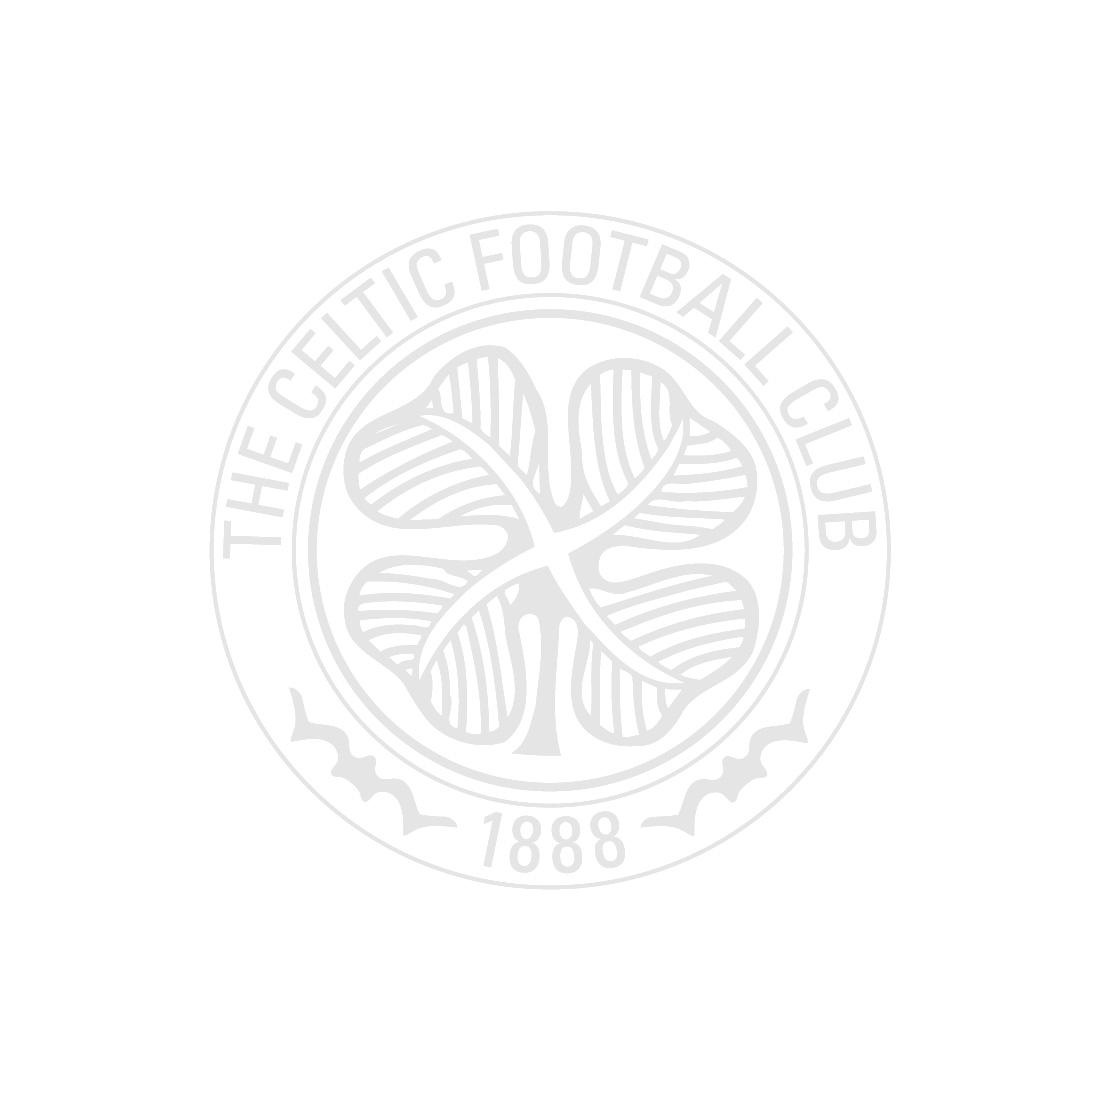 Celtic 1988 Centenary Crest Bronx